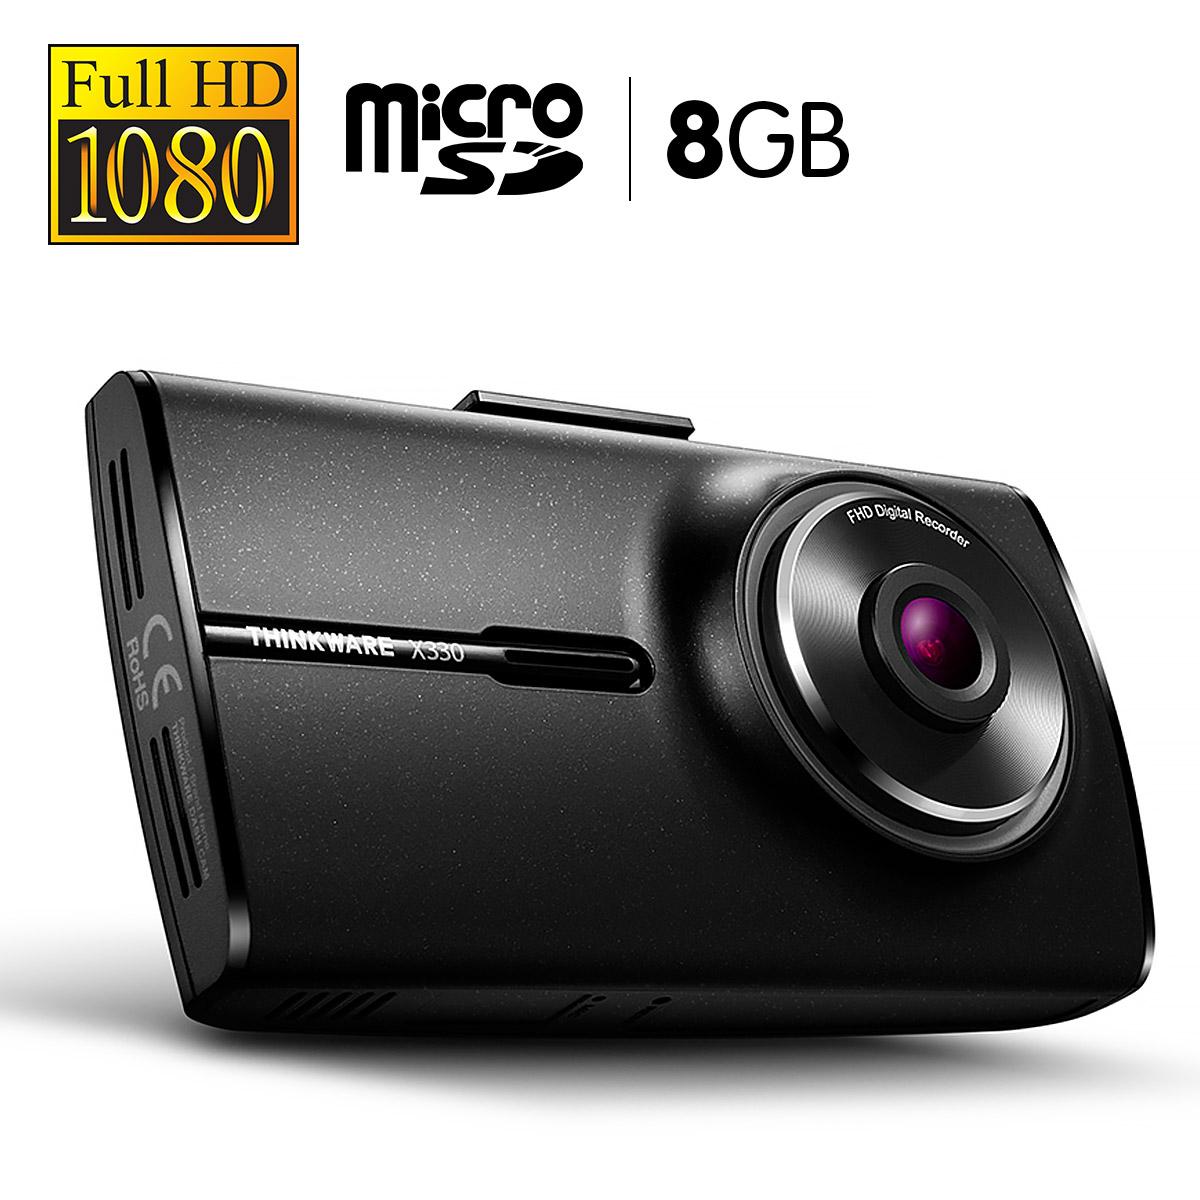 THINKWARE 1080P Full HD Dash Cam With 8GB Micro SD - X33008